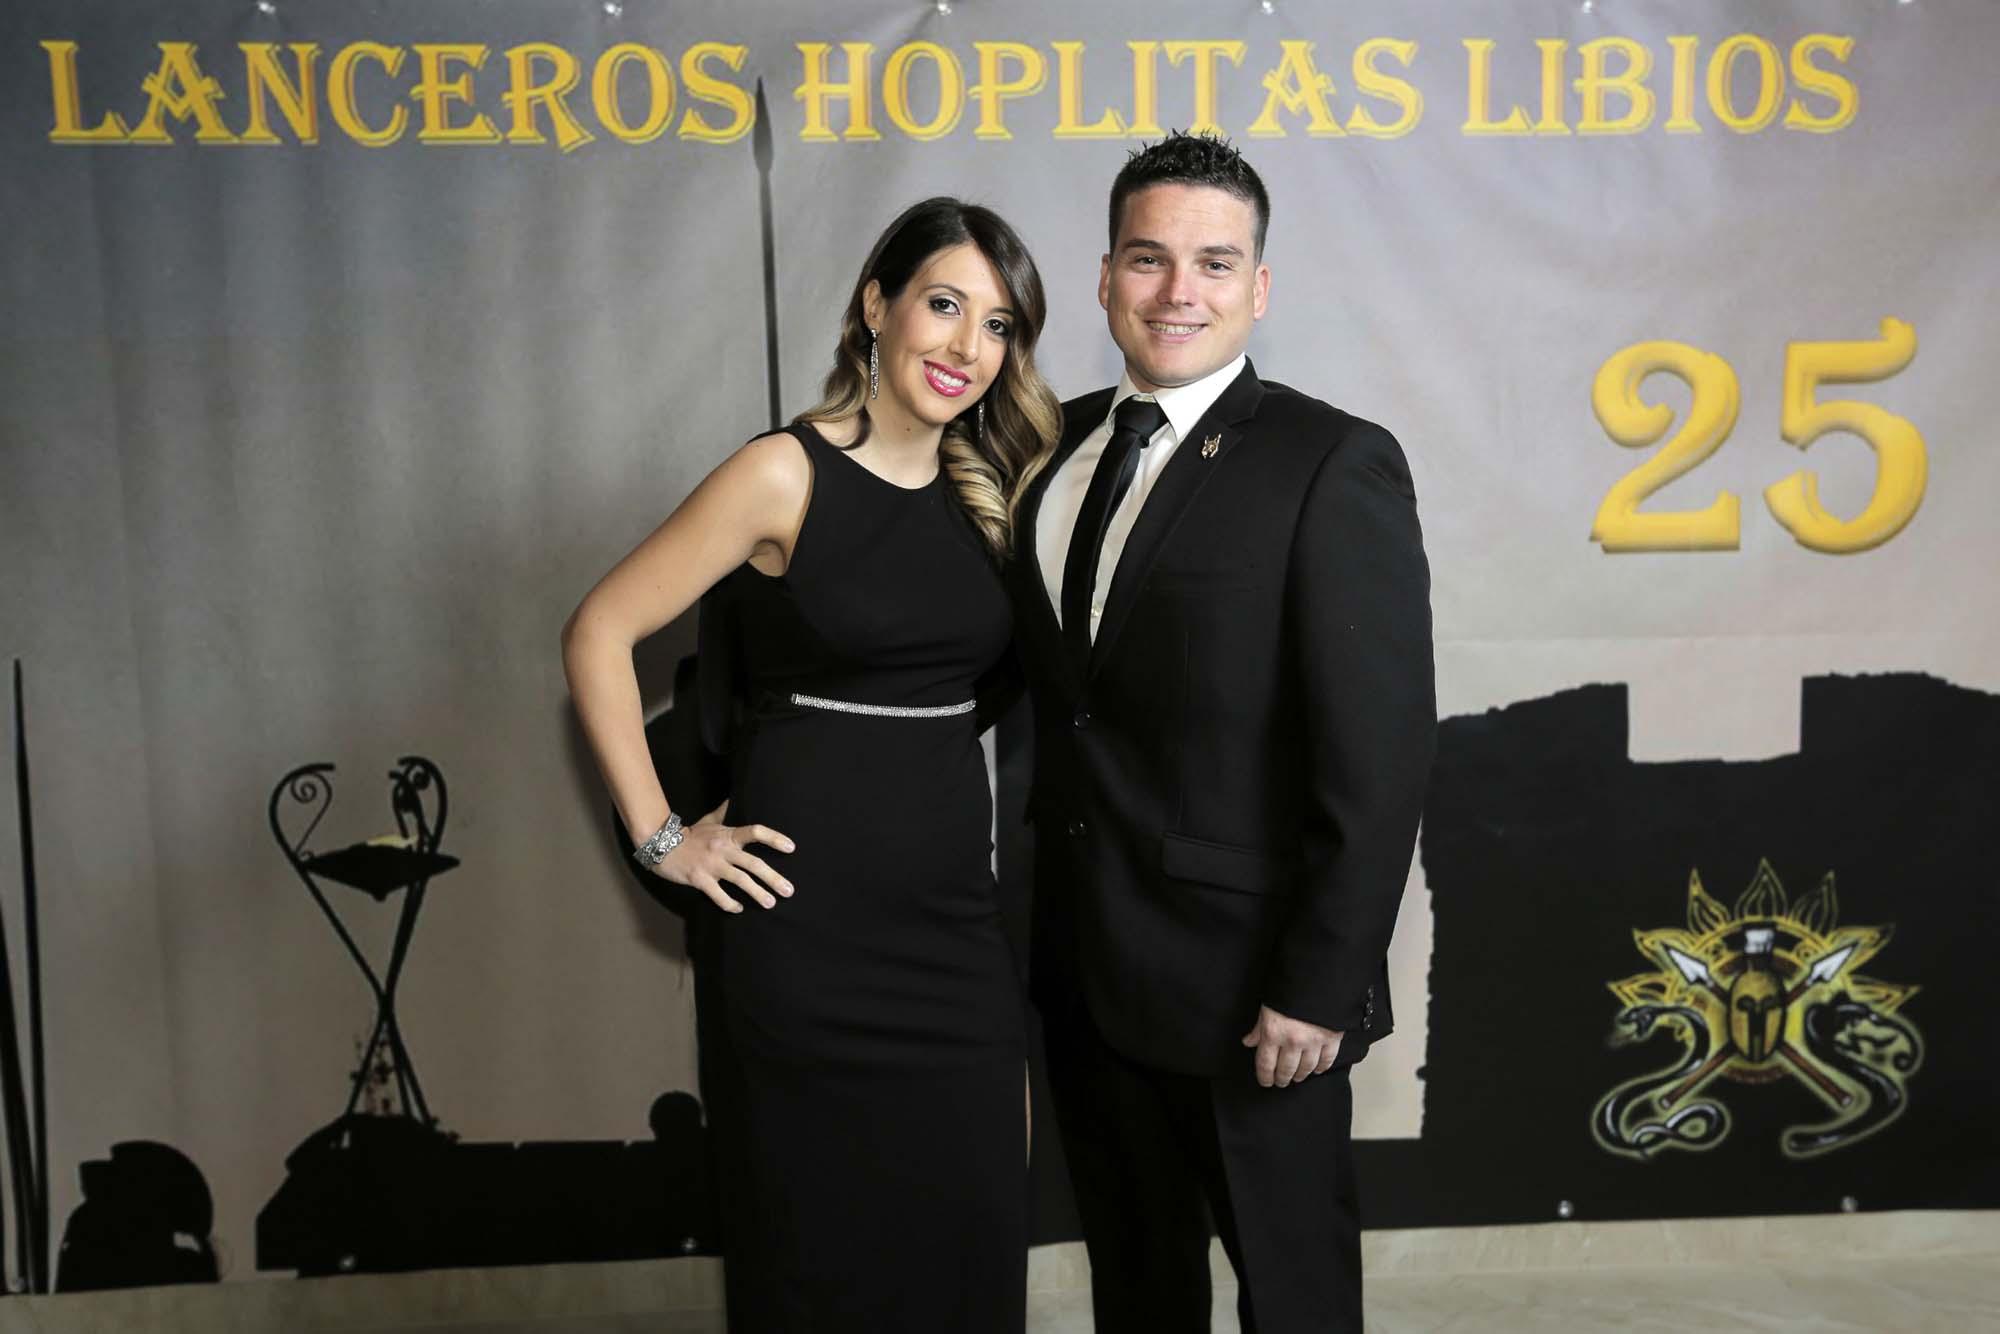 Lanceros Hoplitas Libios  (236)